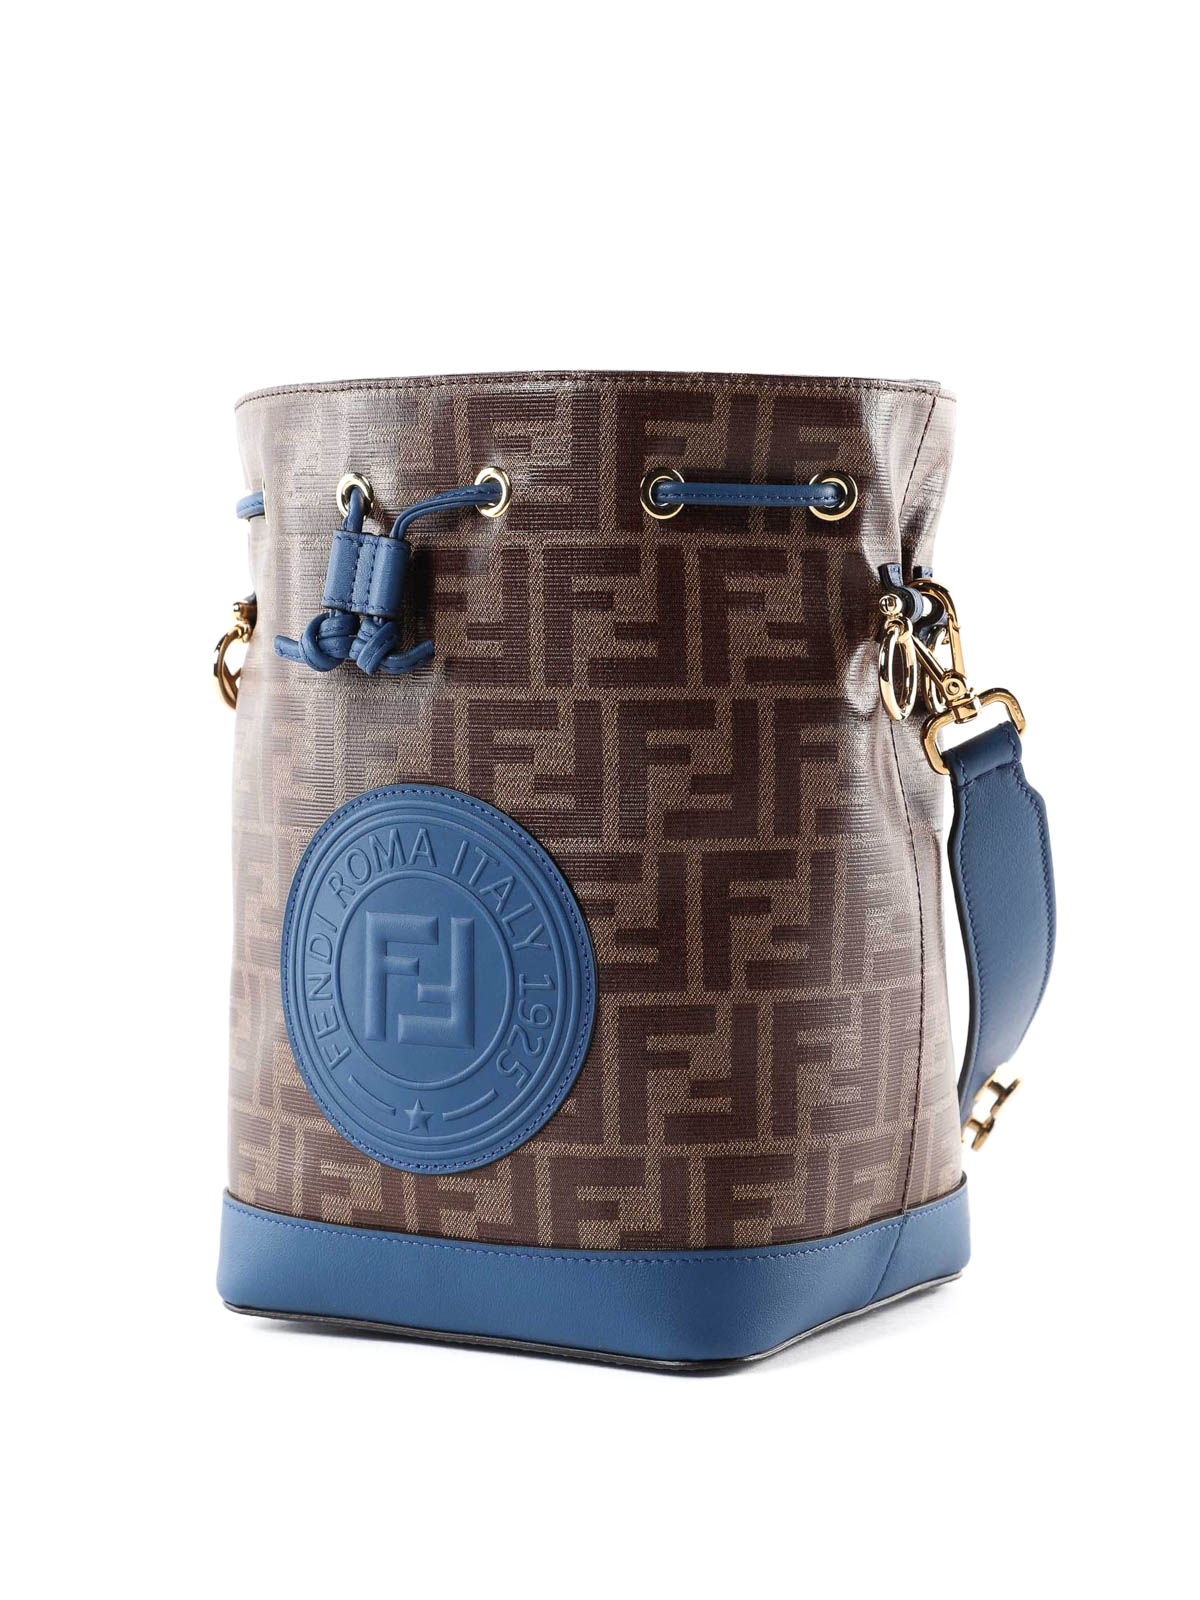 d2621cb6ffe5 FENDI  Bucket bags online - Mon Tresor S coated canvas blue bucket bag